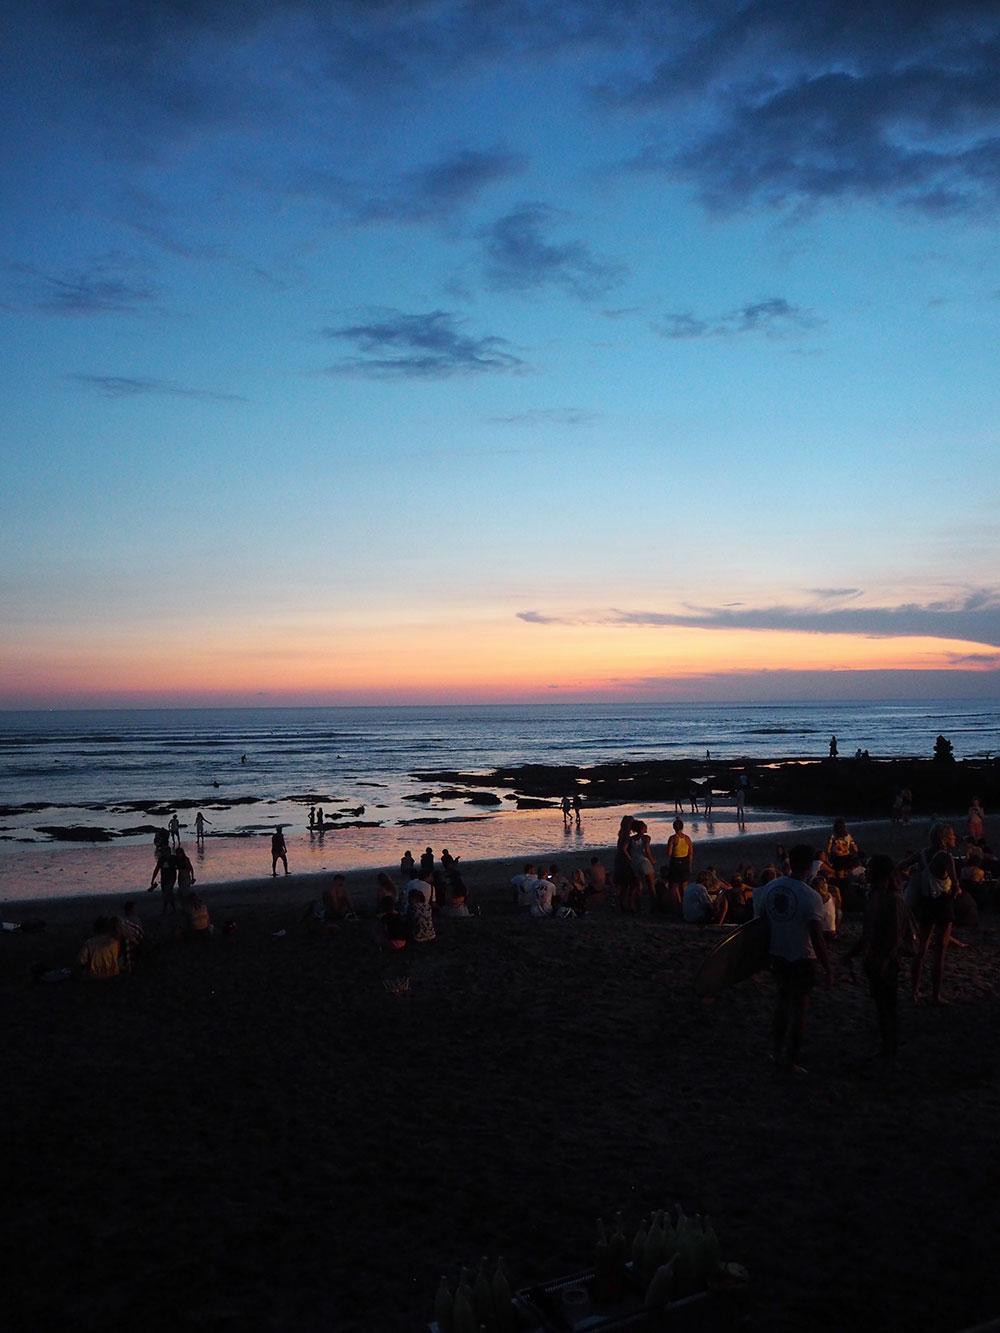 RosyCheeks-Bali-Canggu-Beach-sunset